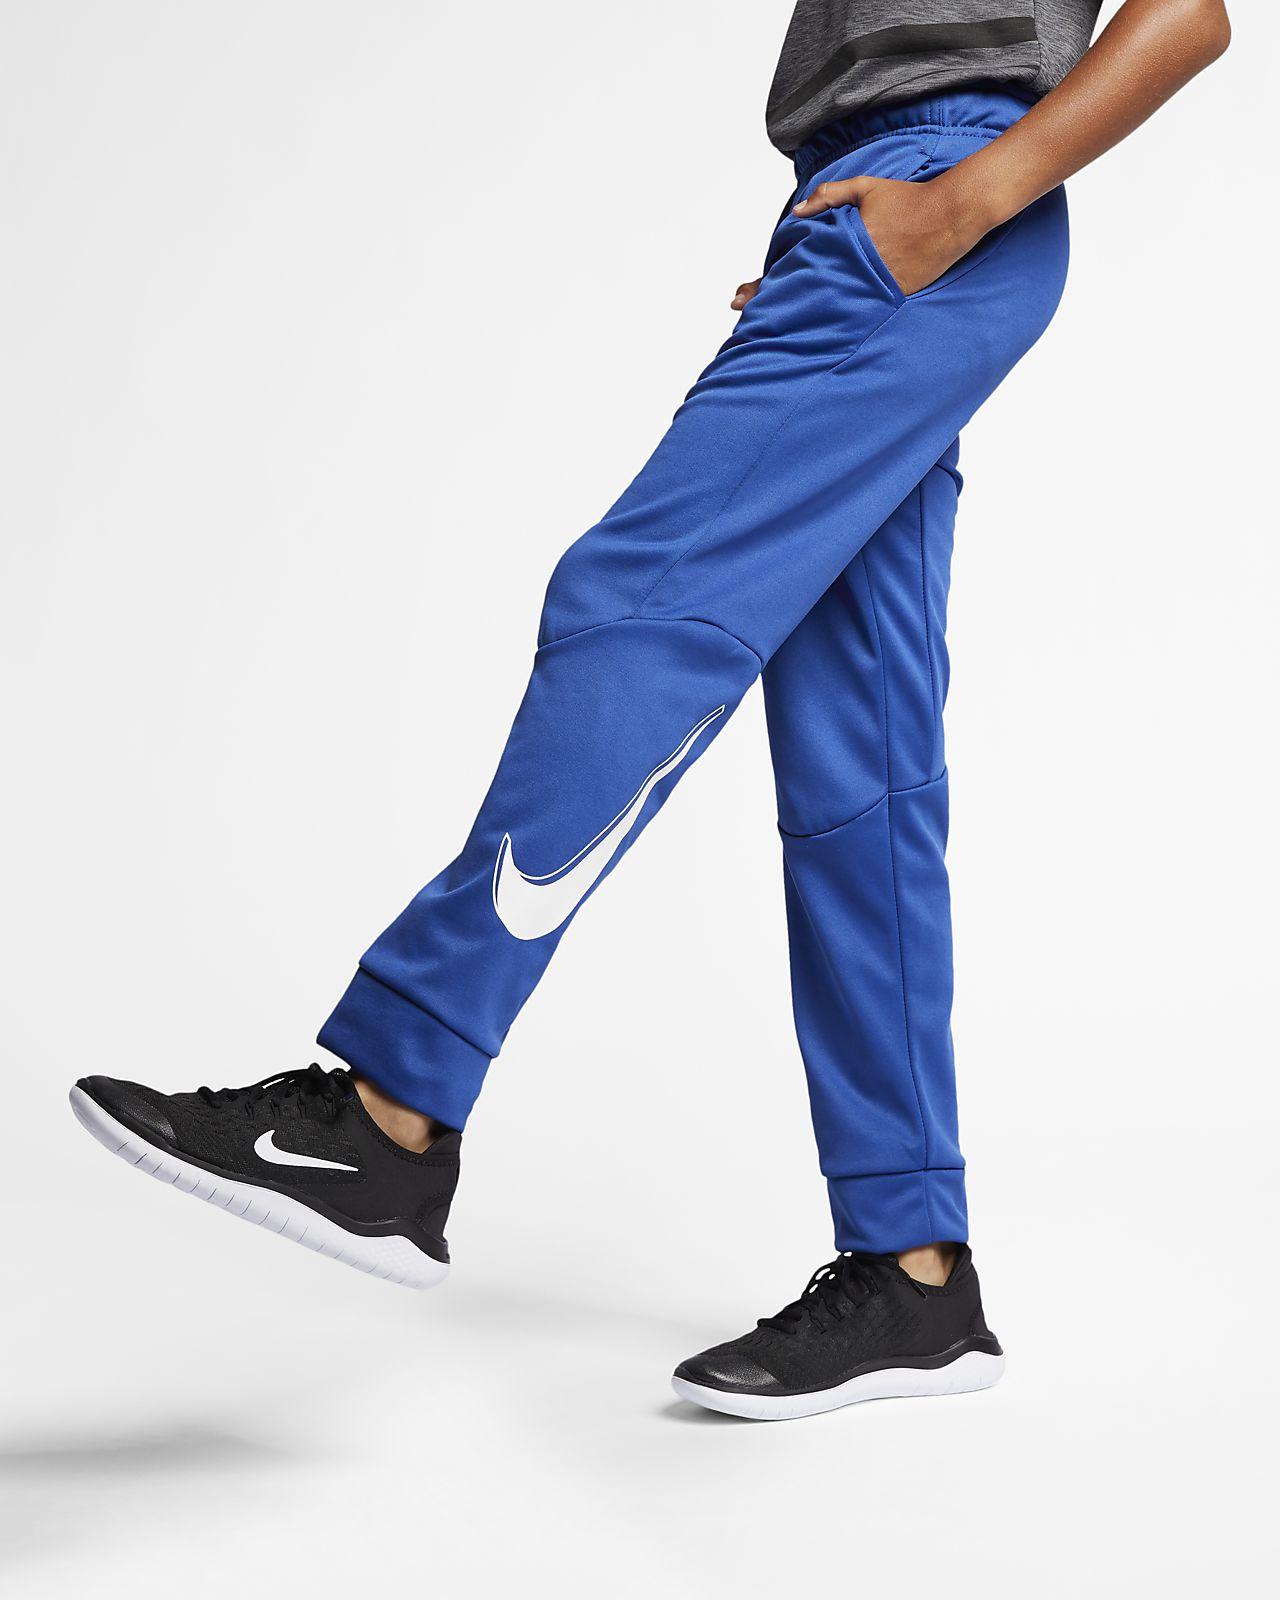 Pantalon de training Nike Dri-FIT Therma pour Garçon plus âgé